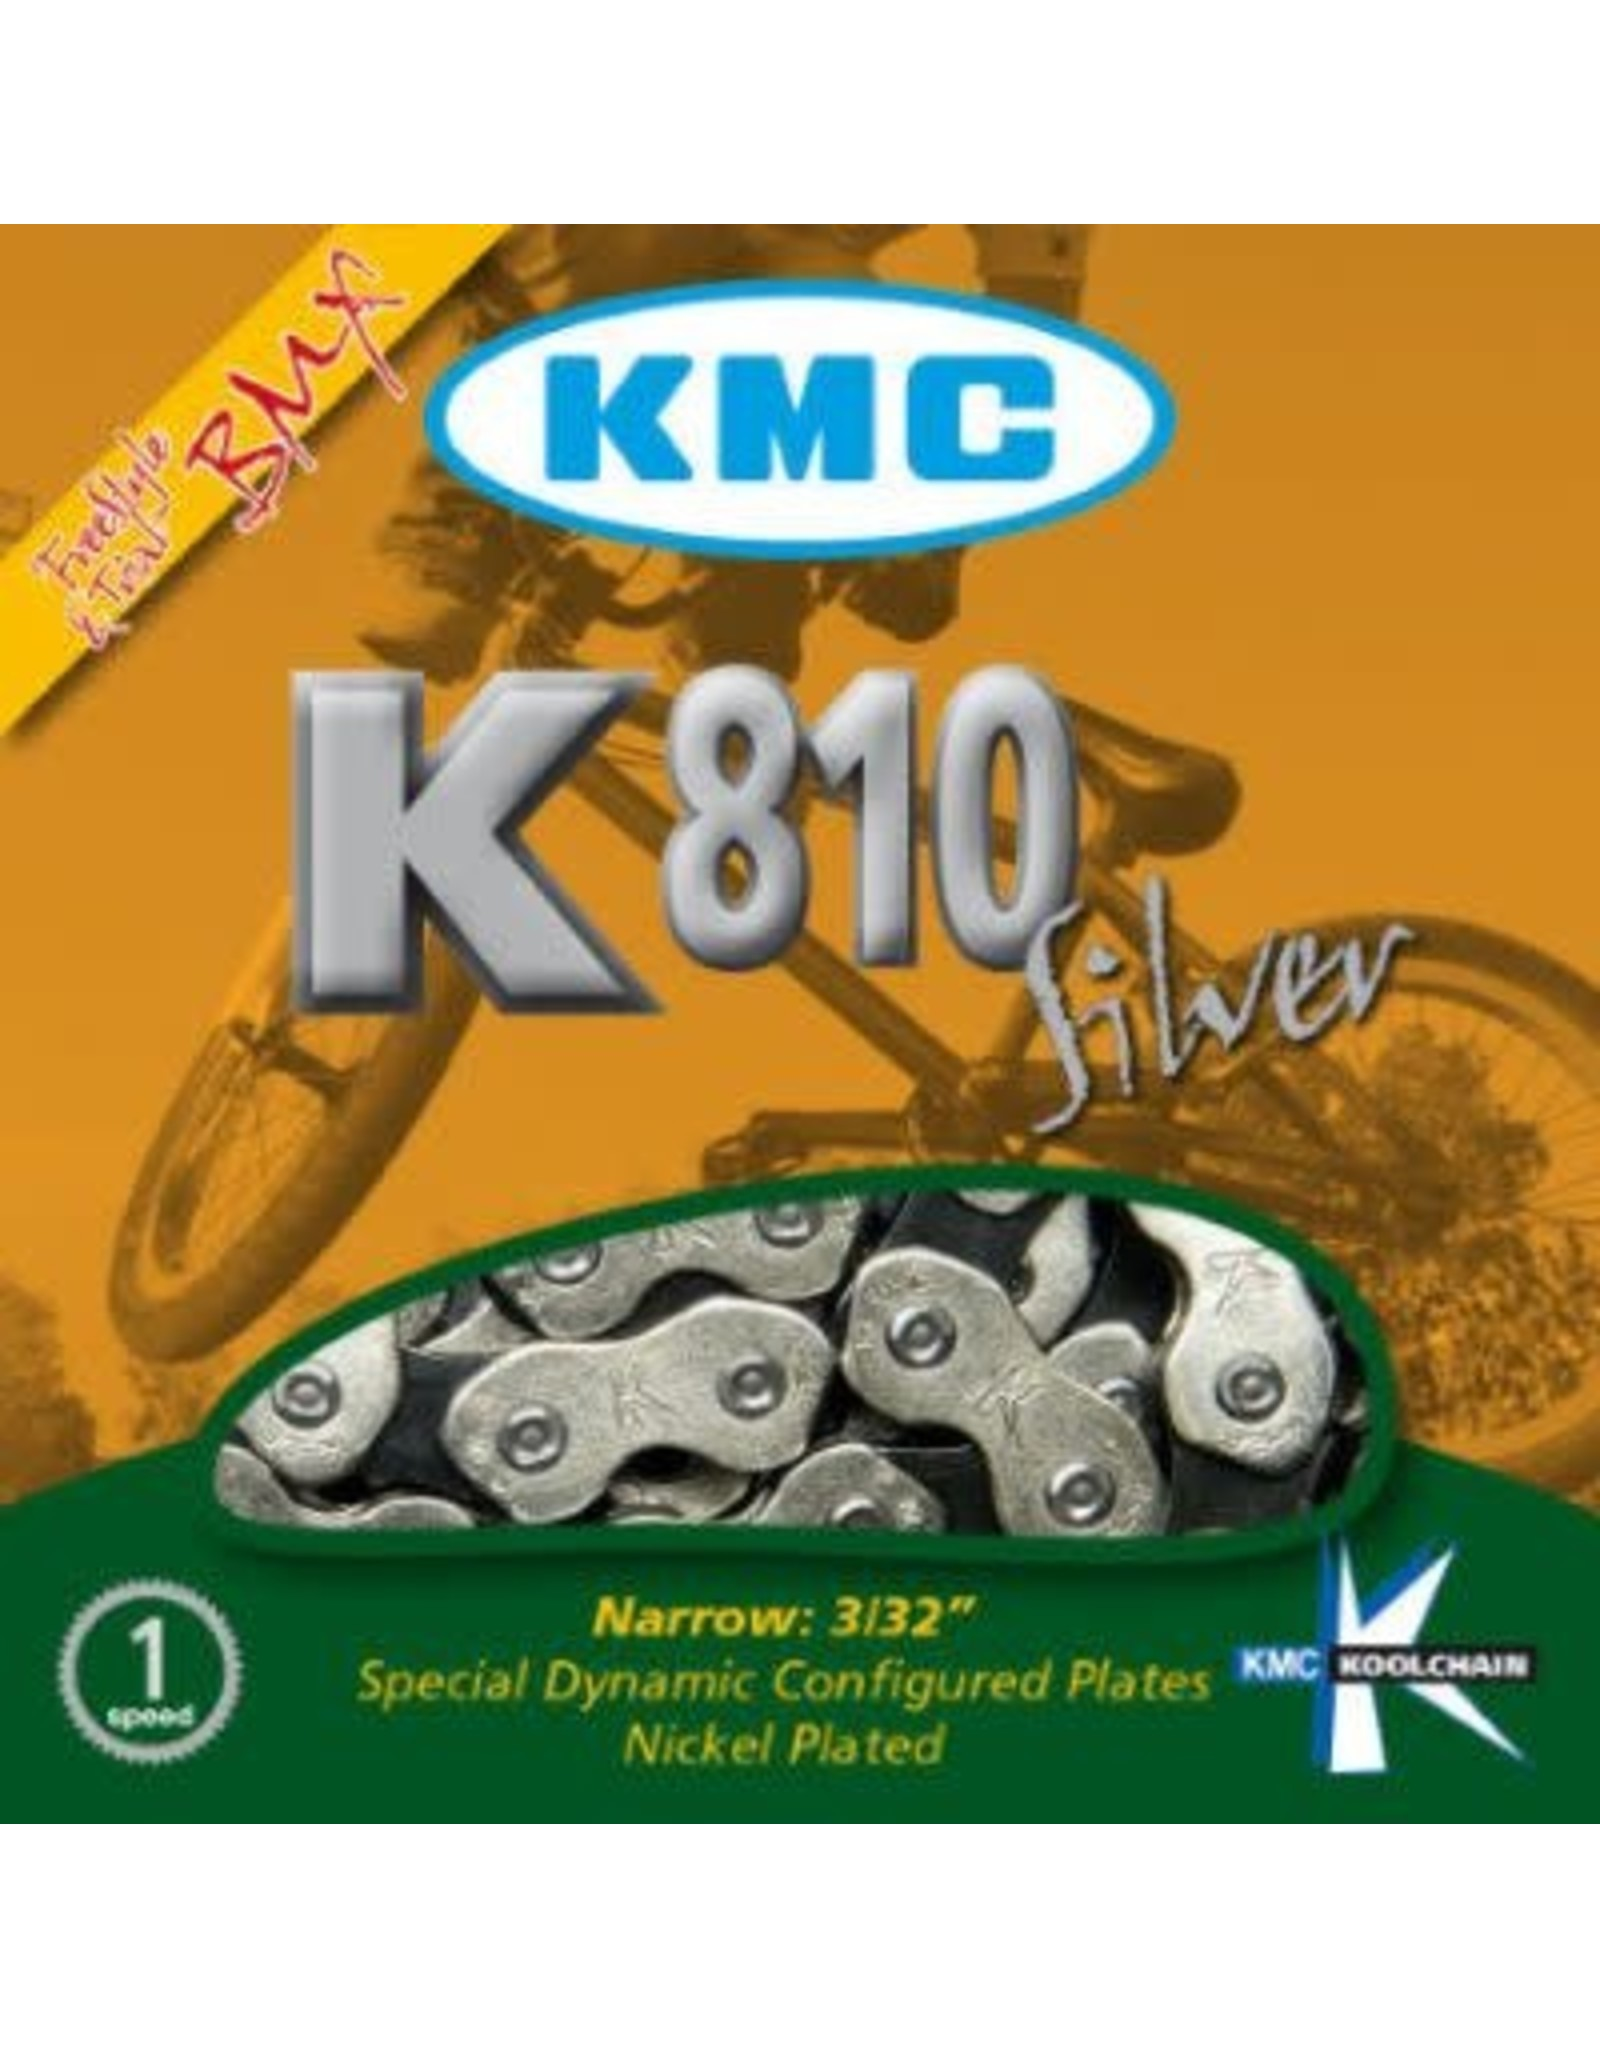 KMC Chain 1/2 x 3/32 - 112 links 1VIT K810